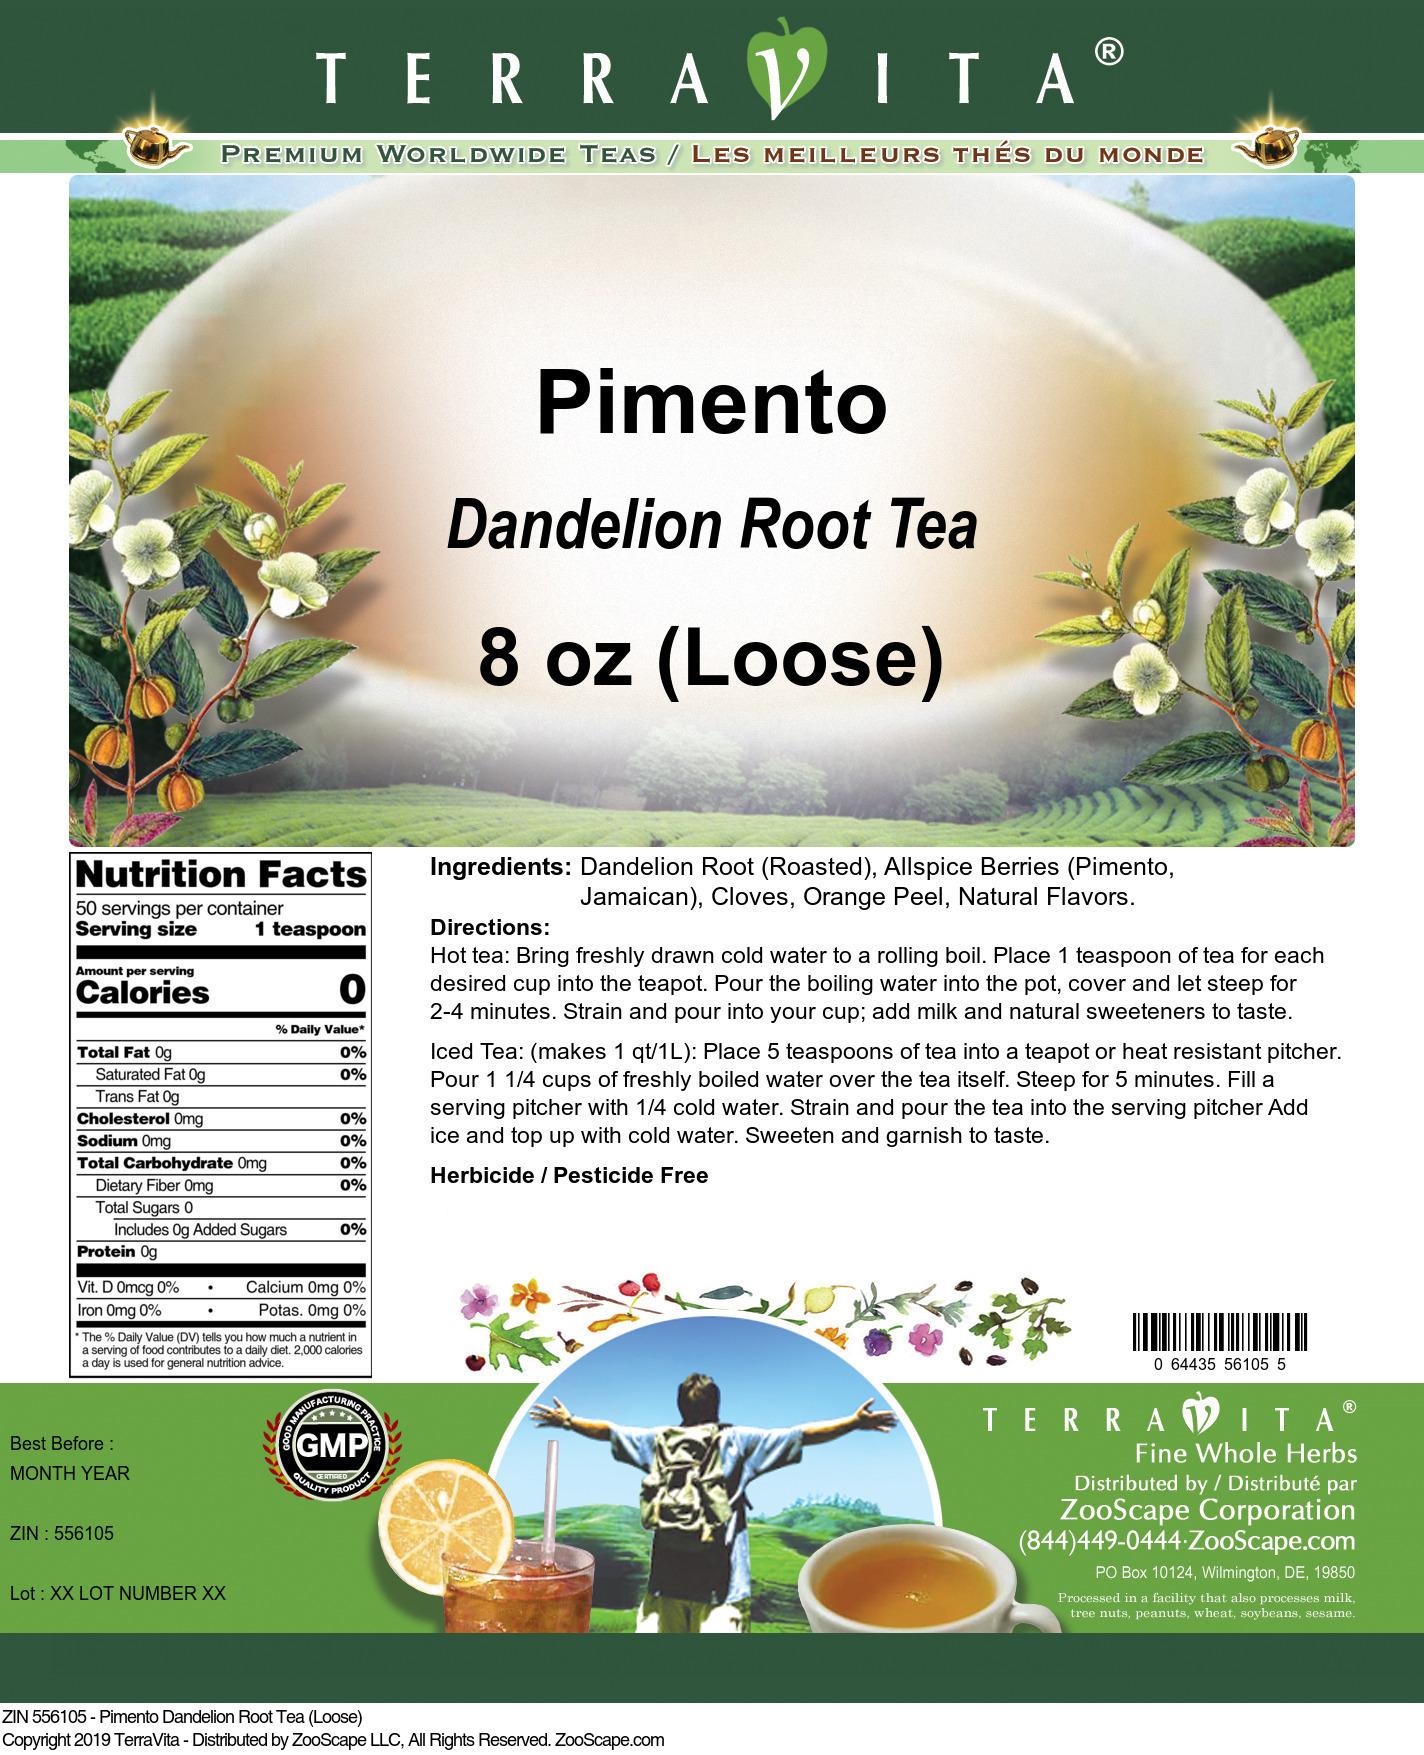 Pimento Dandelion Root